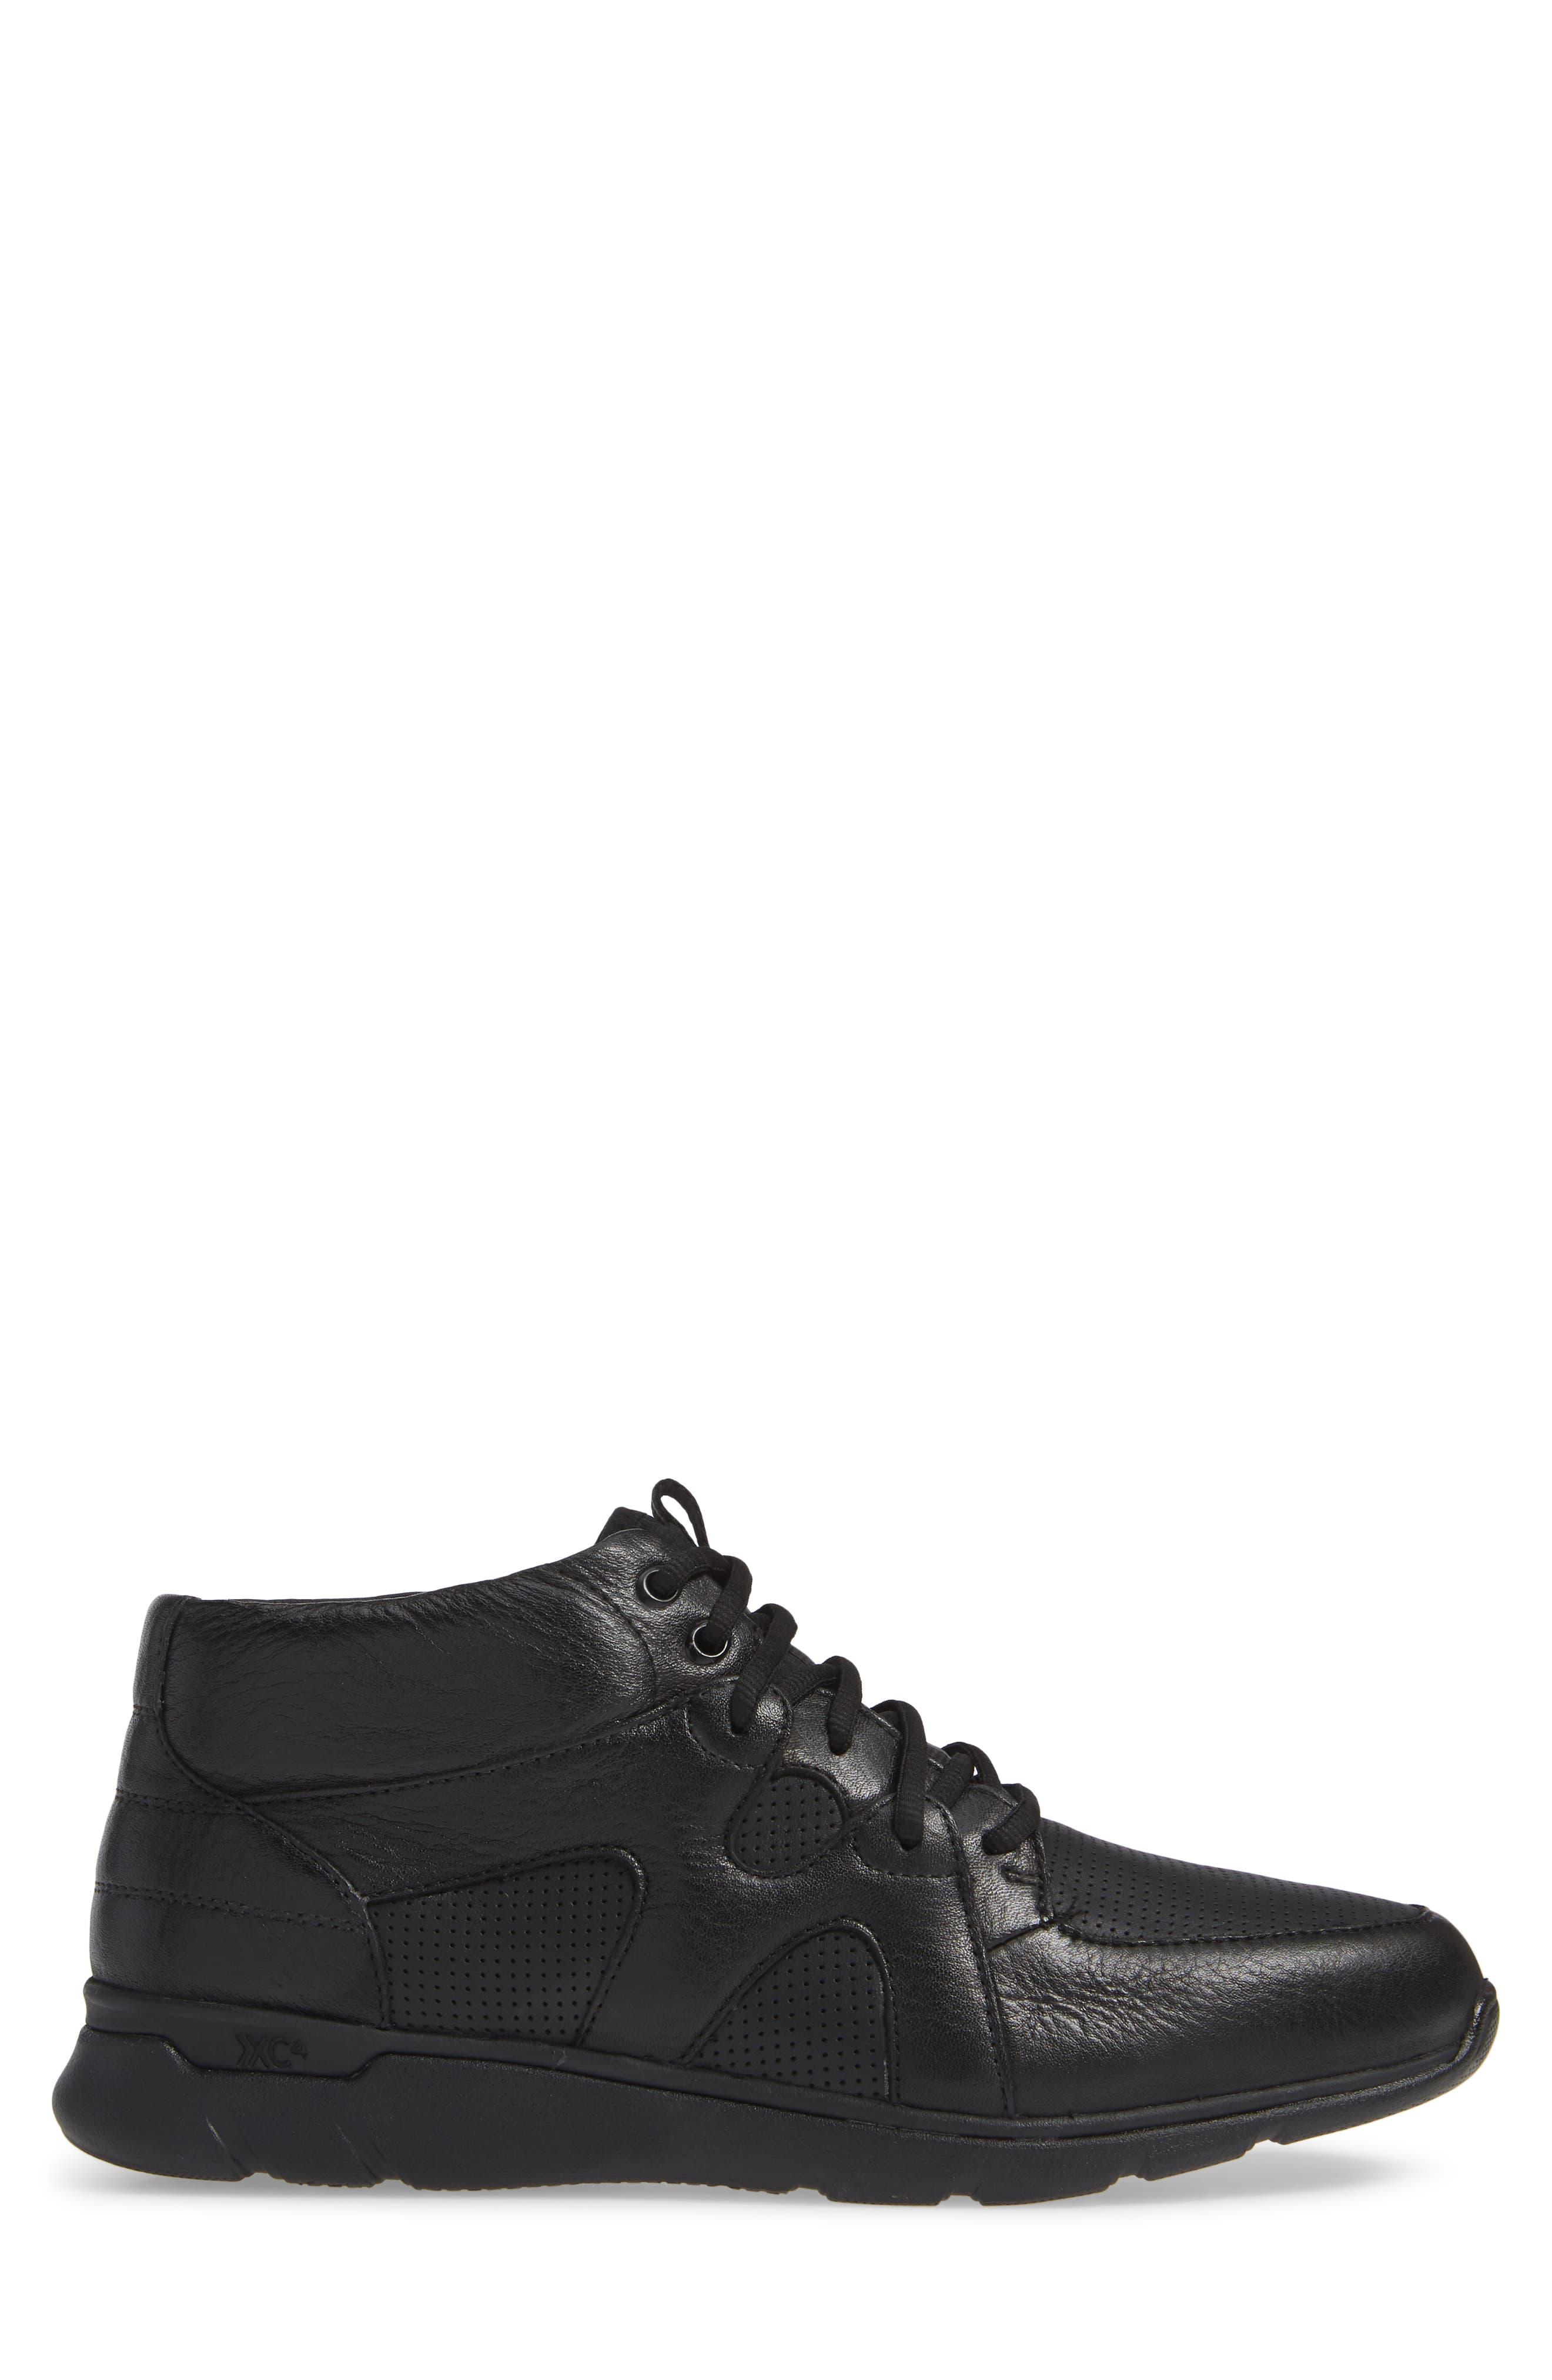 JOHNSTON & MURPHY, Prentiss Waterproof Sneaker, Alternate thumbnail 3, color, BLACK LEATHER